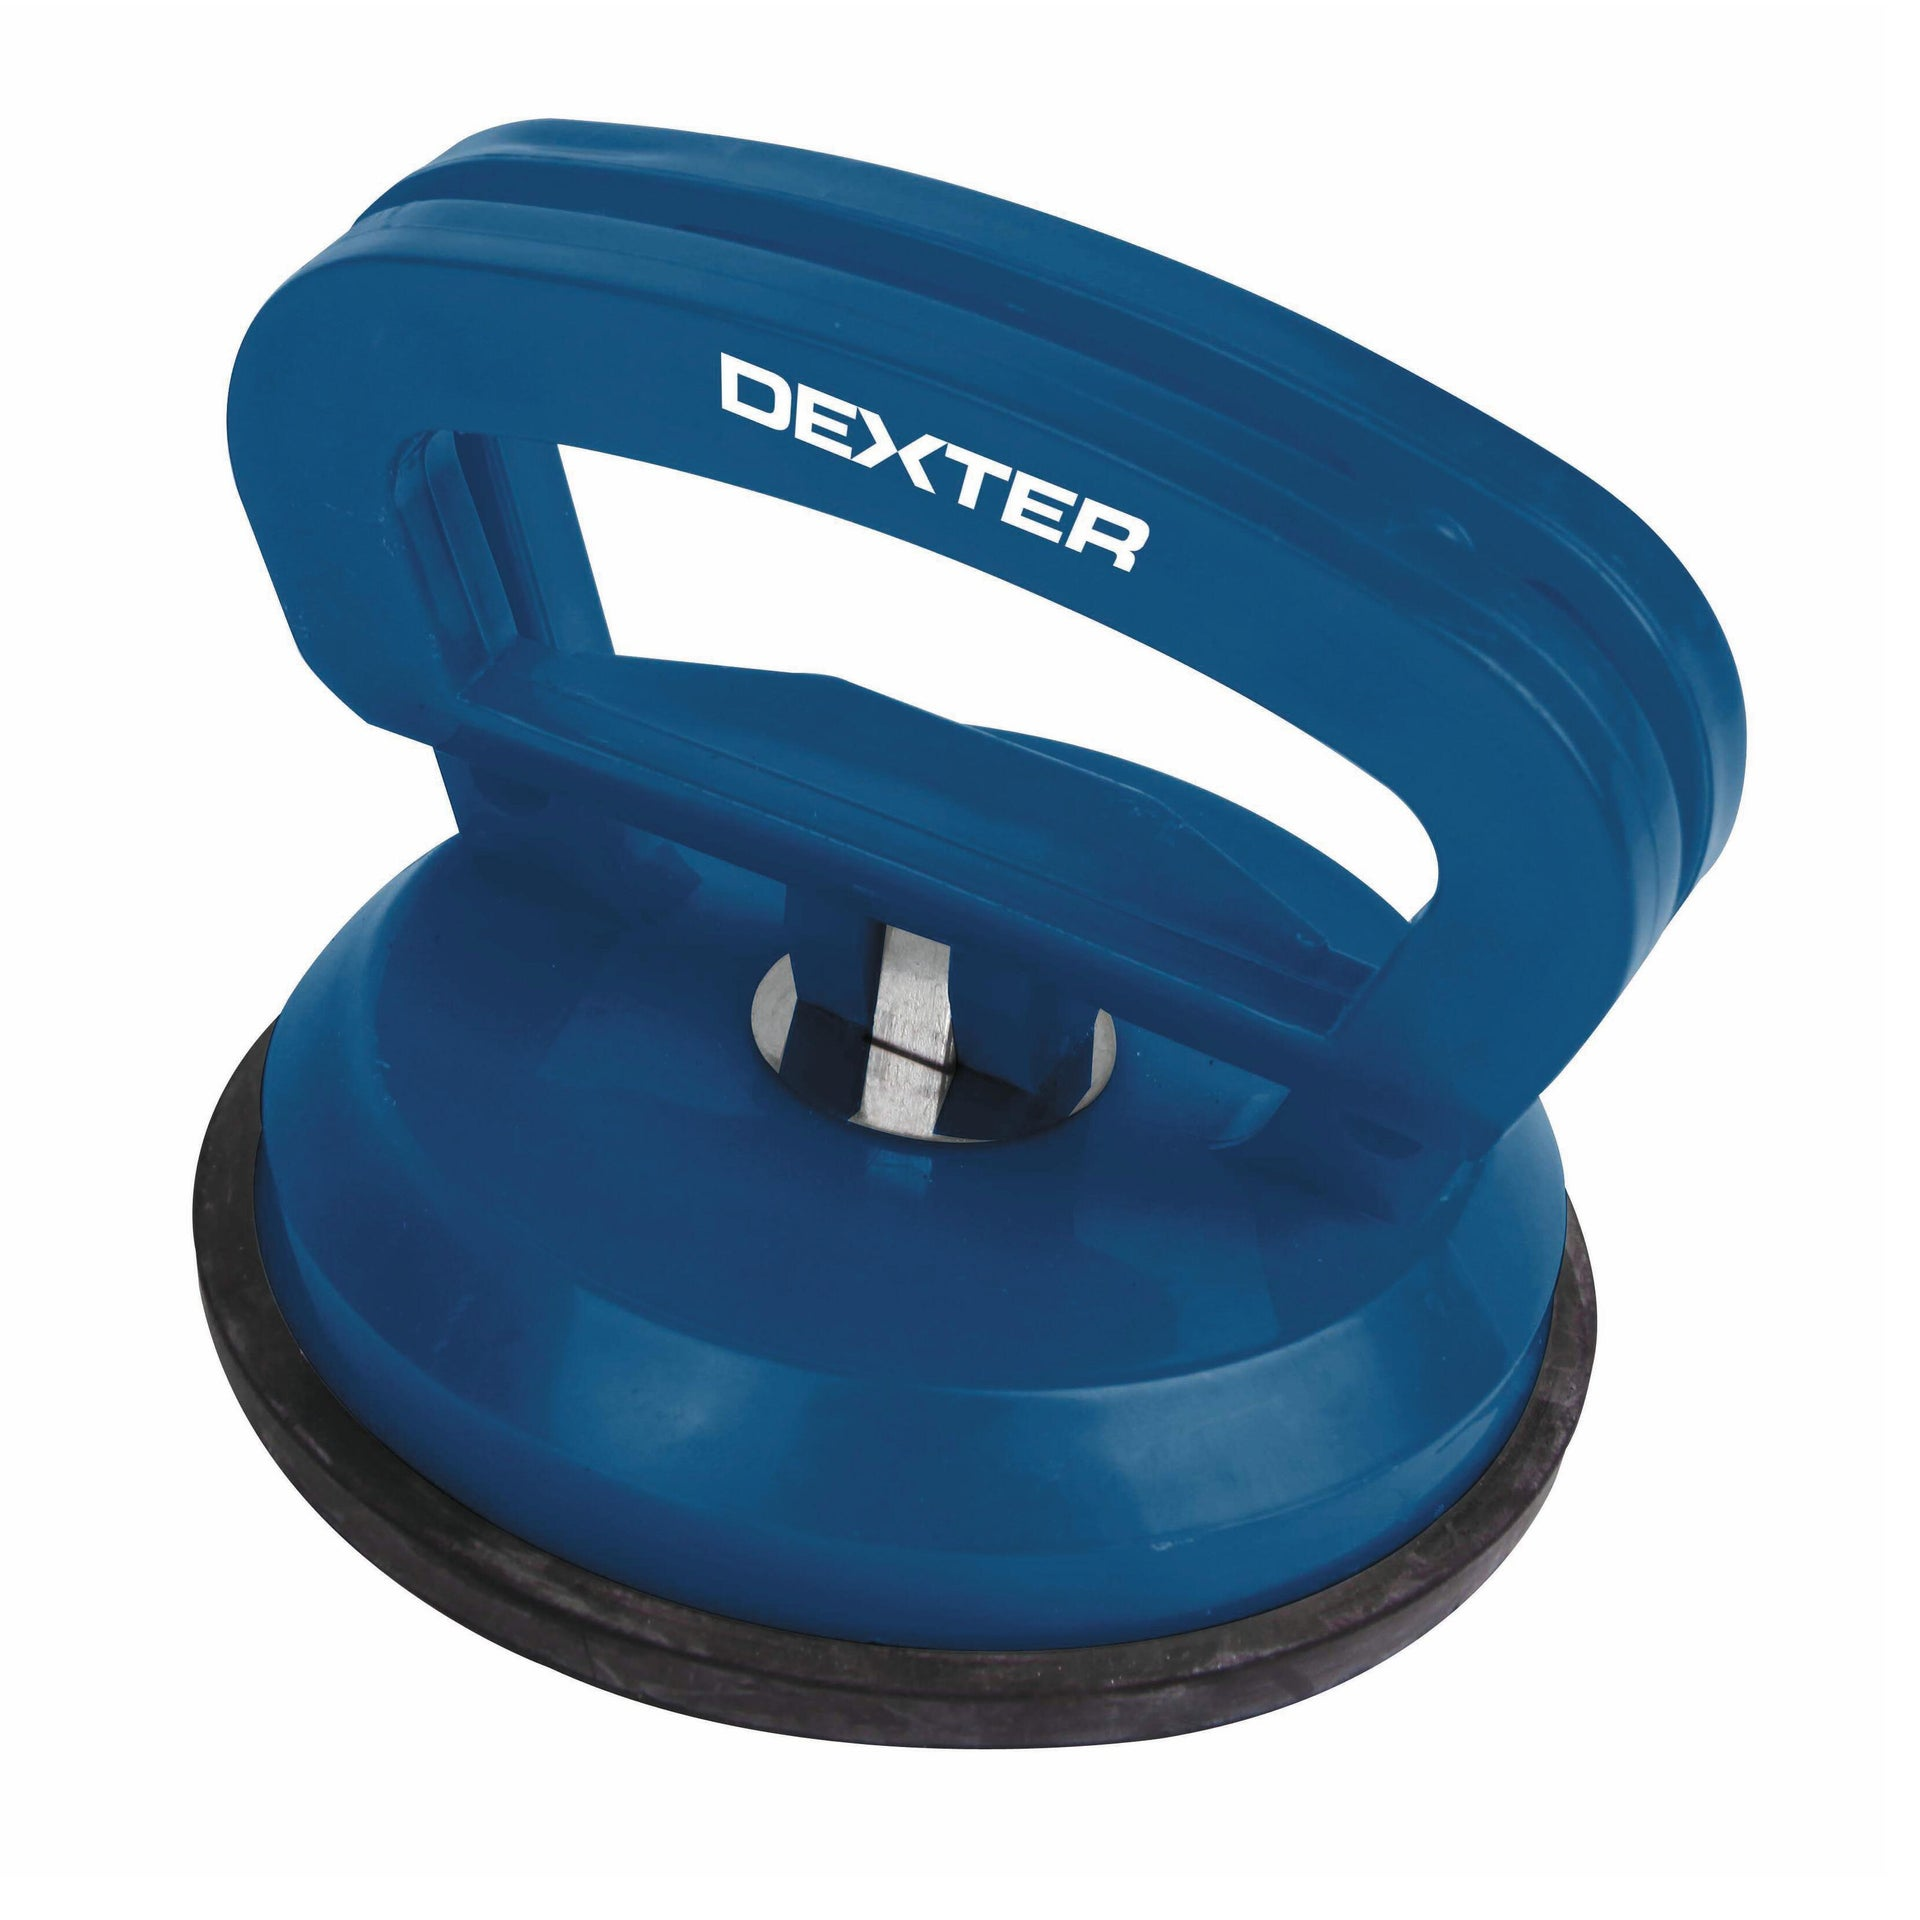 Ventosa per piastrelle DEXTER Ø 115 mm 20 kg